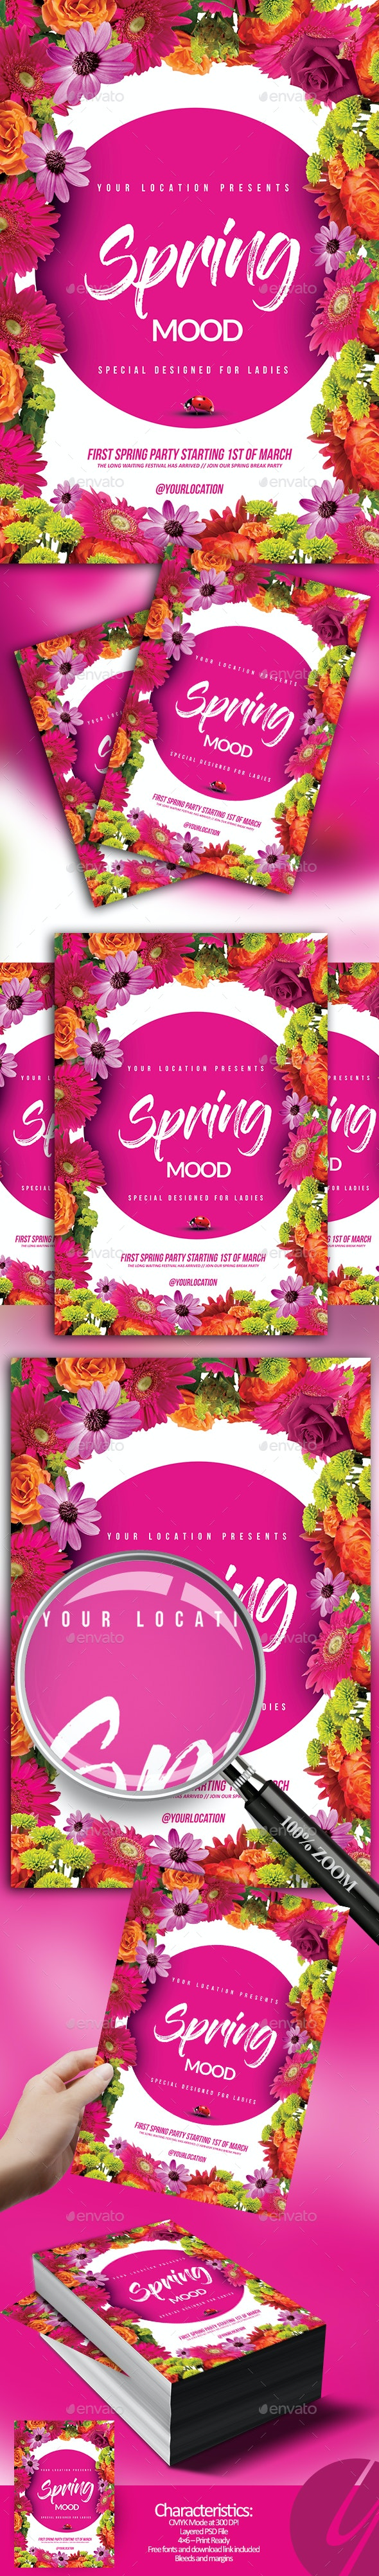 Spring Mood Flyer - Holidays Events